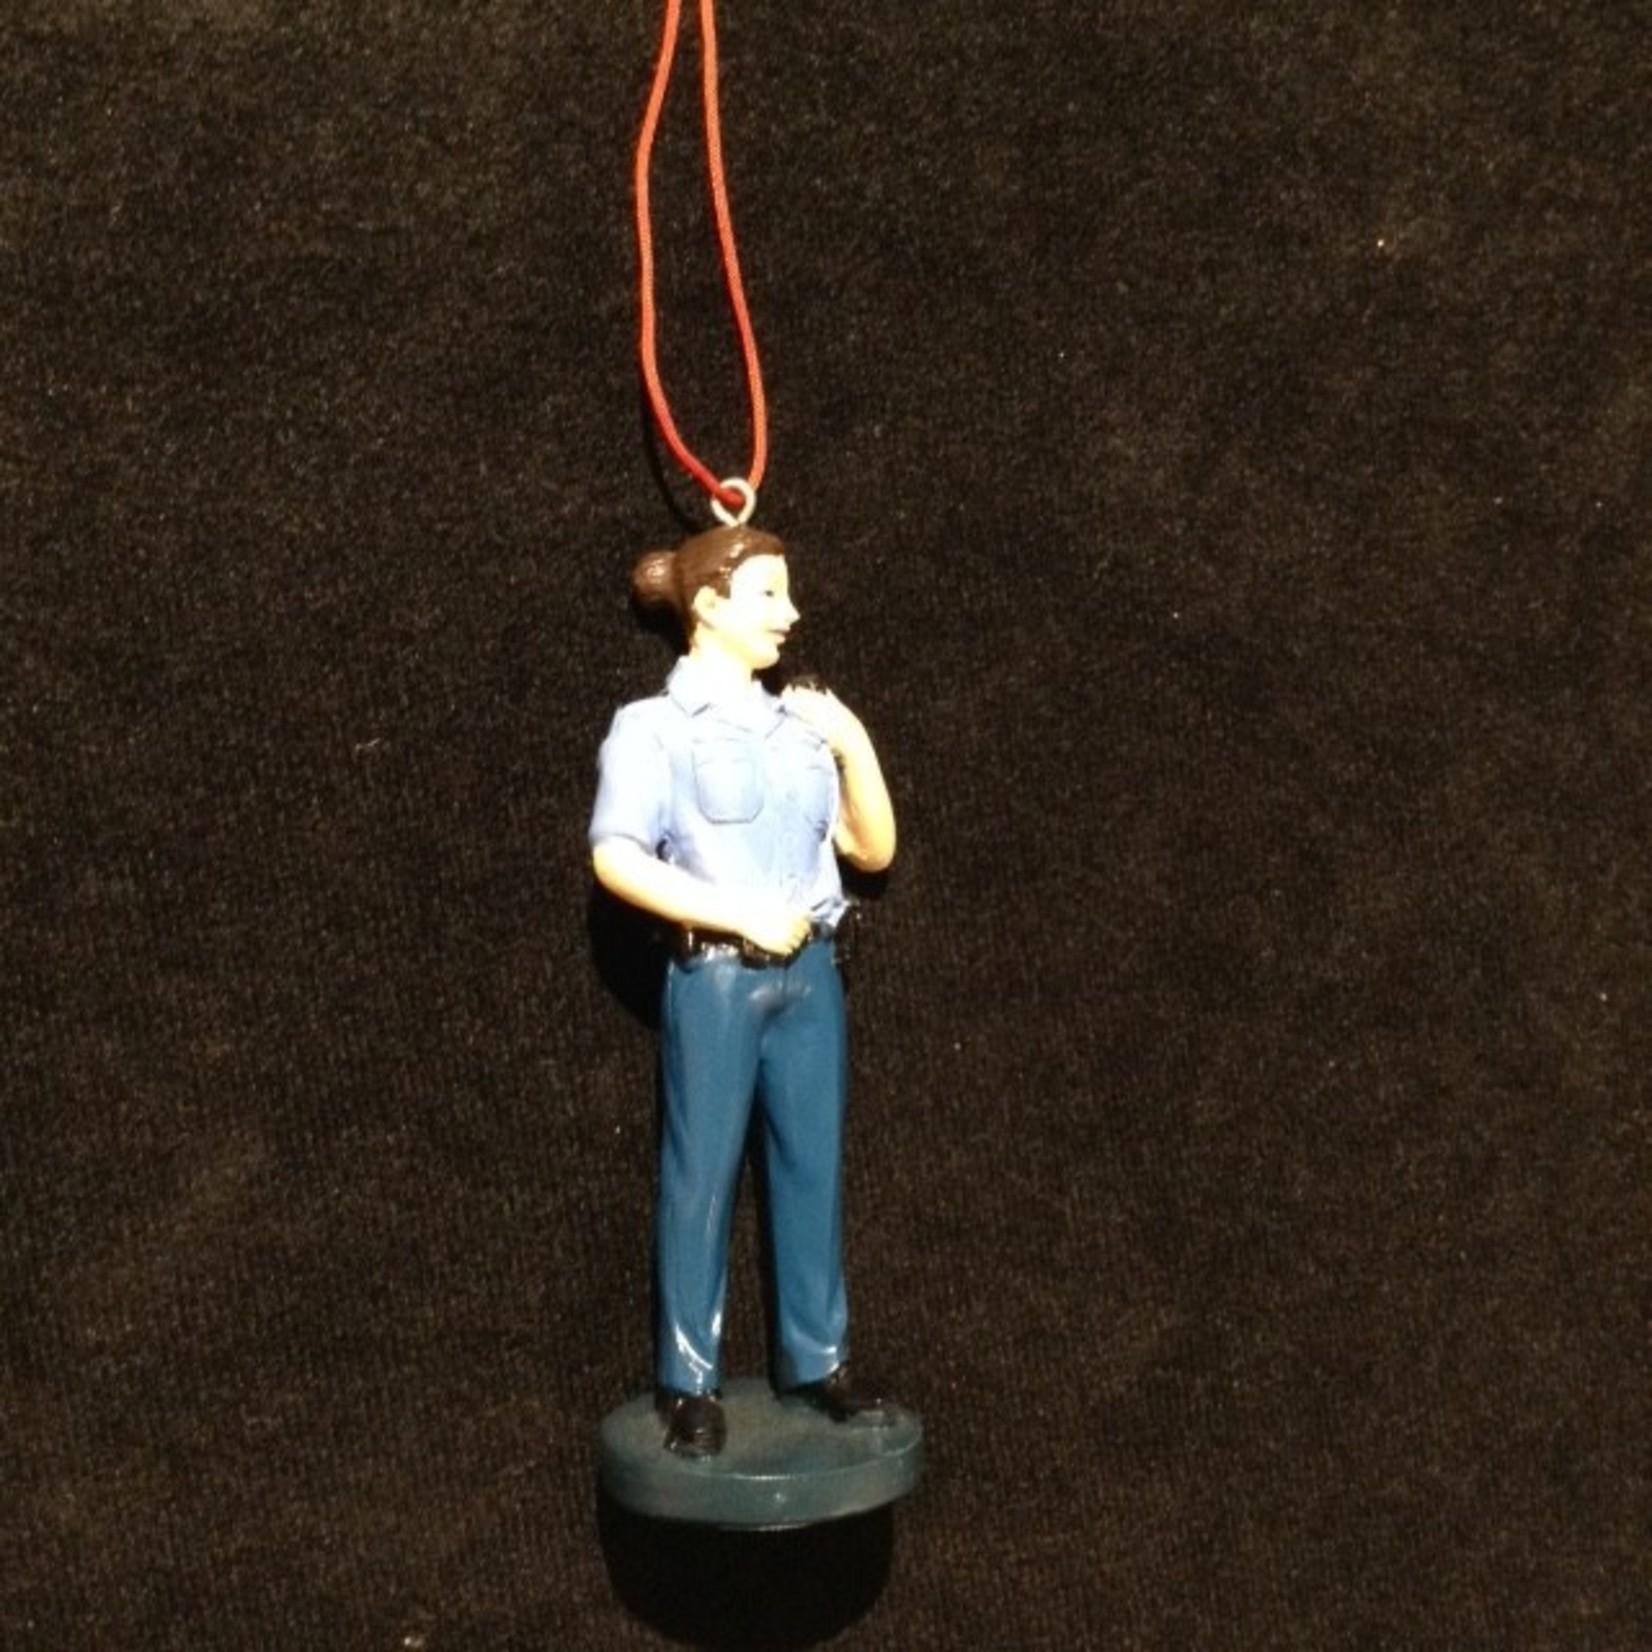 Policewoman Ornament